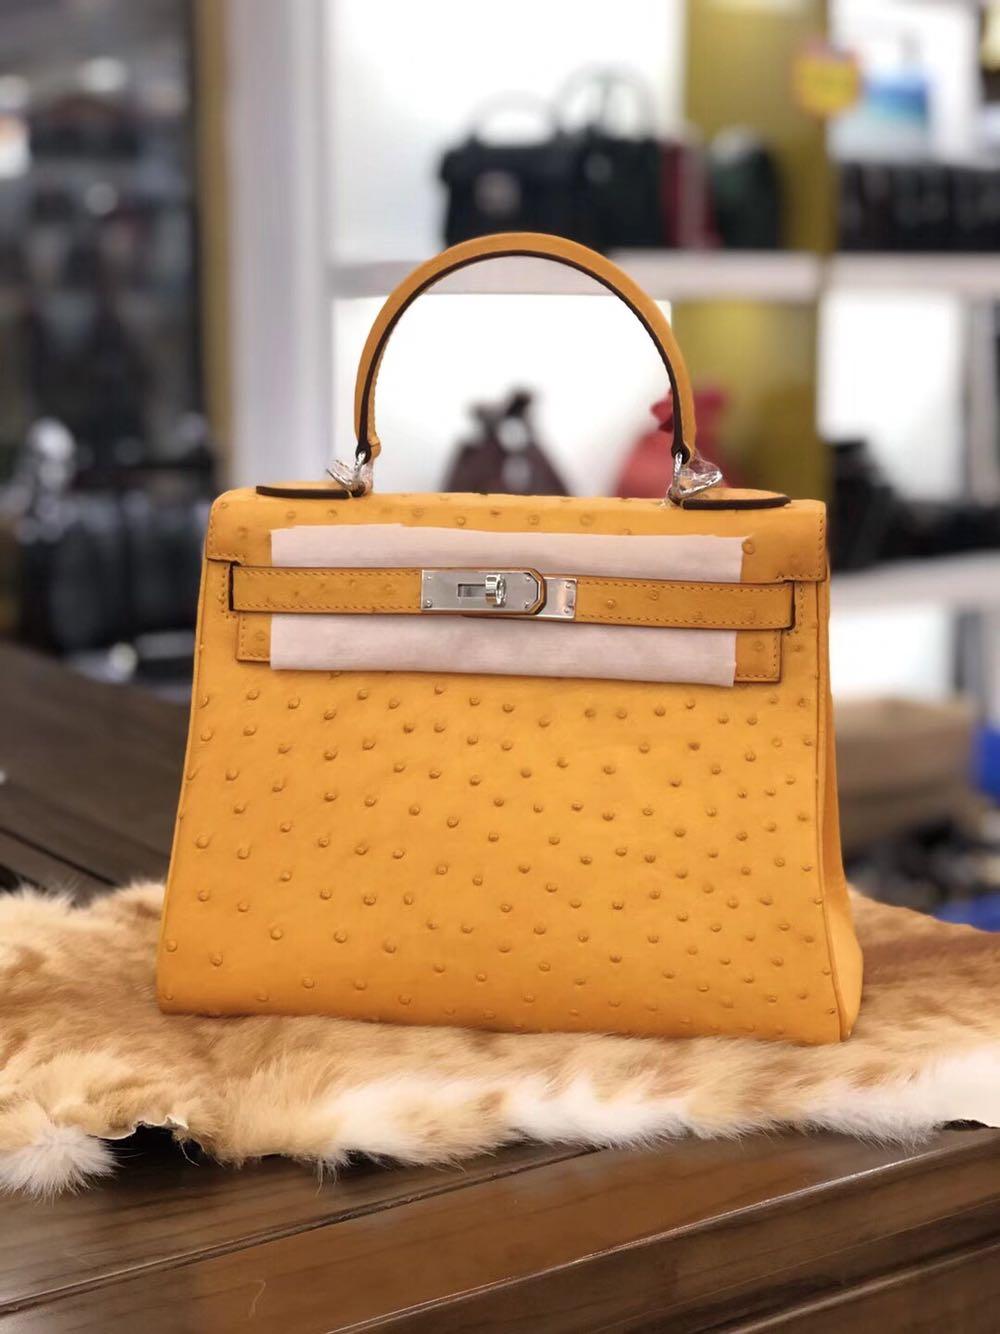 Kelly ostrich leather womens Handbag Shoulder Bag South Africa ostrich leather top layer leather inside stainless steel hardware